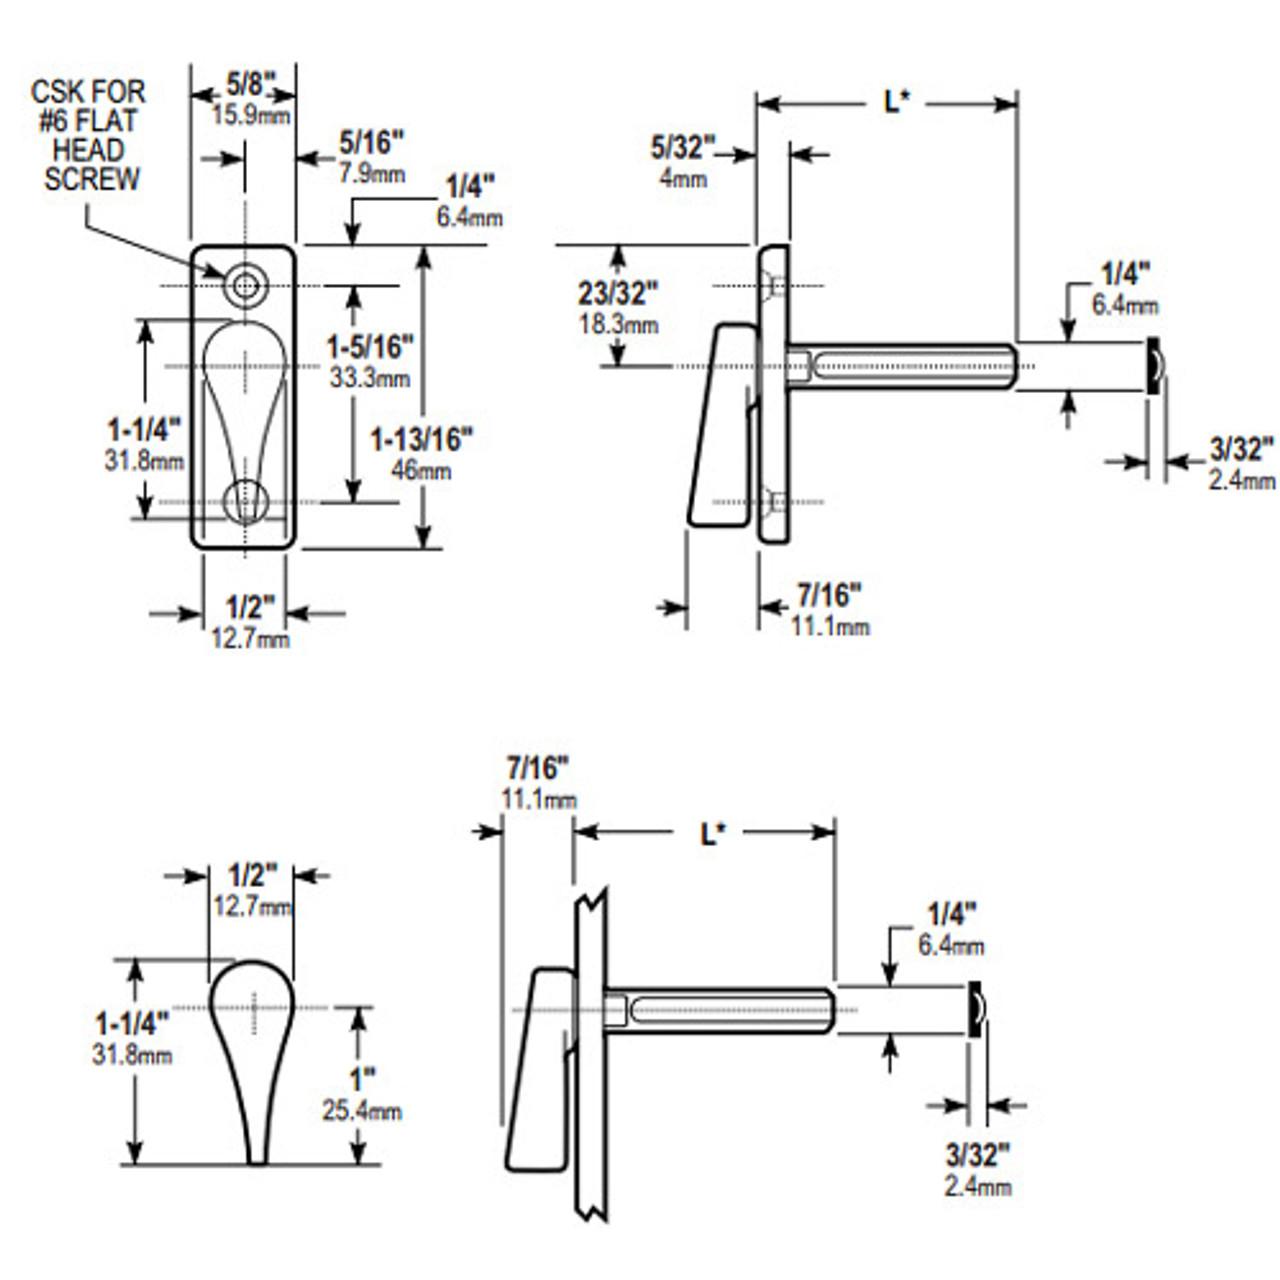 1000-21-25-121 Adams Rite 1000 Series Turns Dimensional View